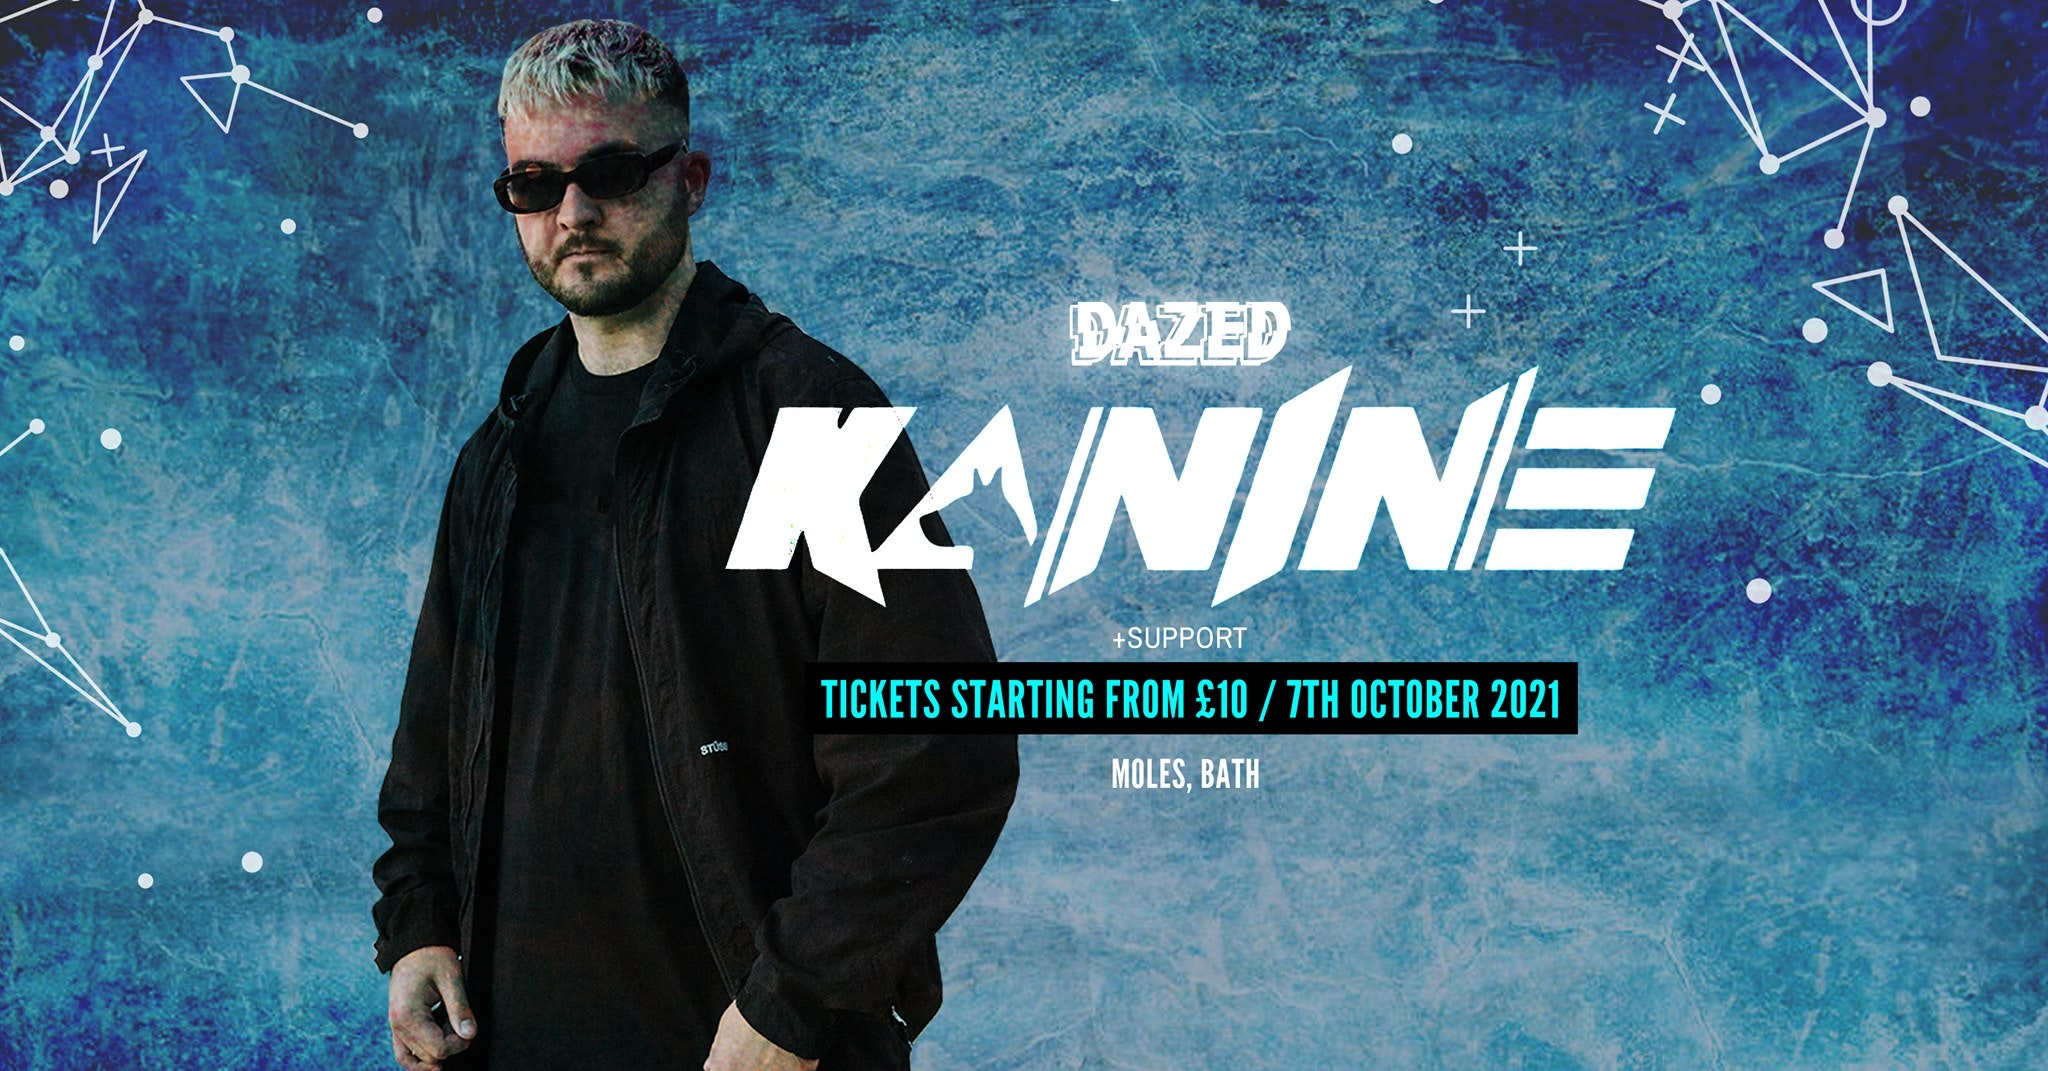 Dazed Presents: Kanine